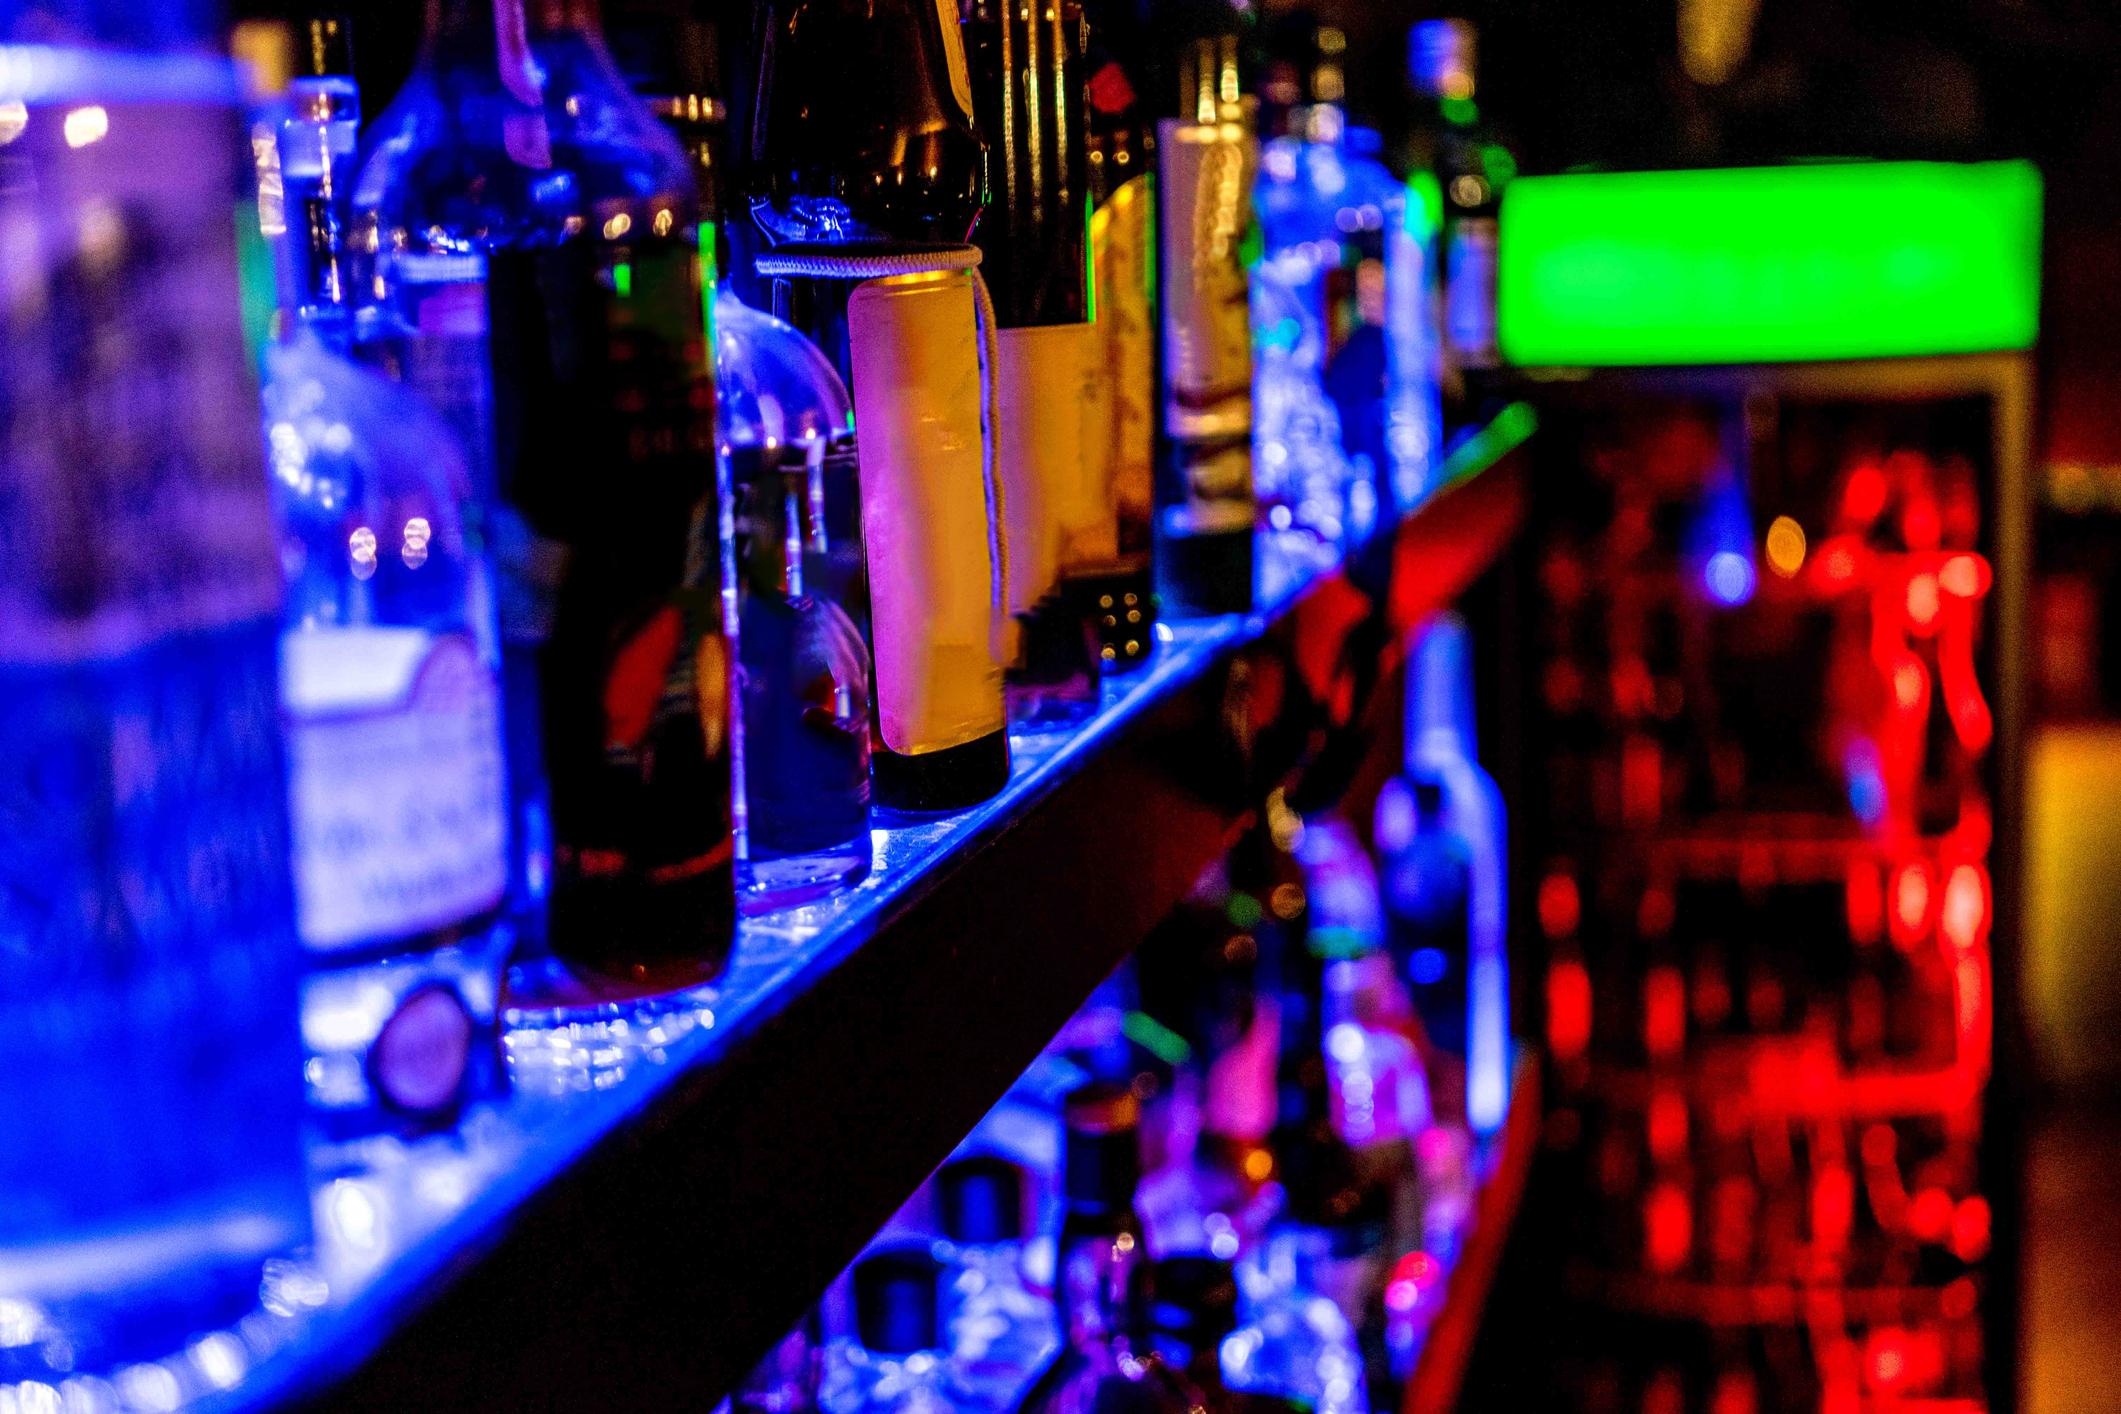 Bottles on a shelf, lightened up. spirituous beverages at a bar.